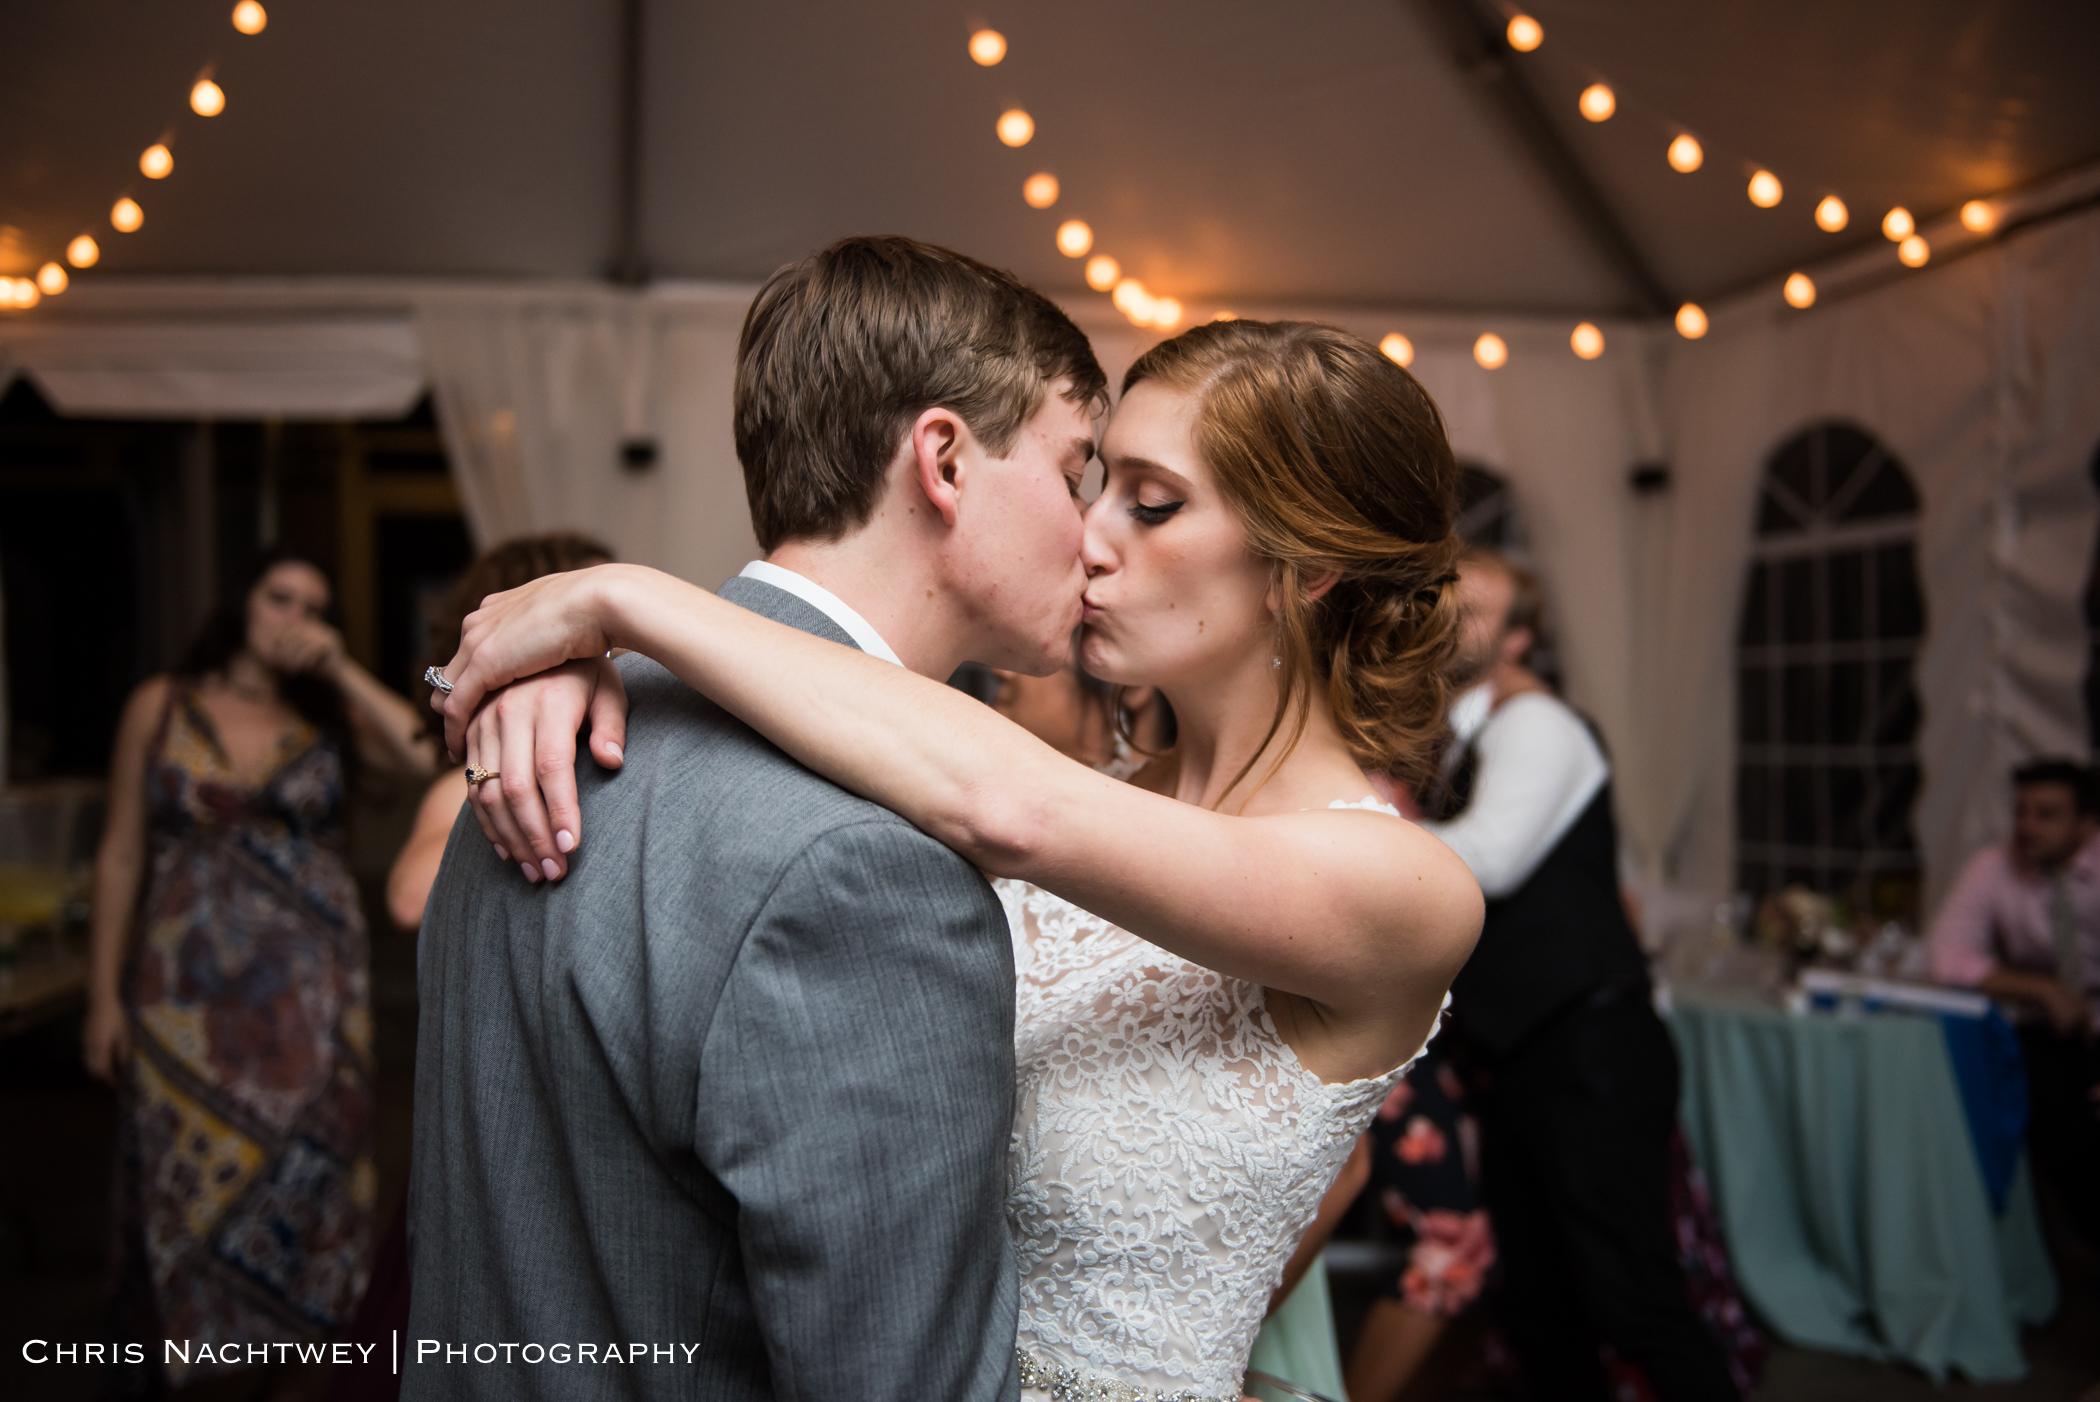 harkness-wedding-photos-chris-nachtwey-photography-2018-51.jpg